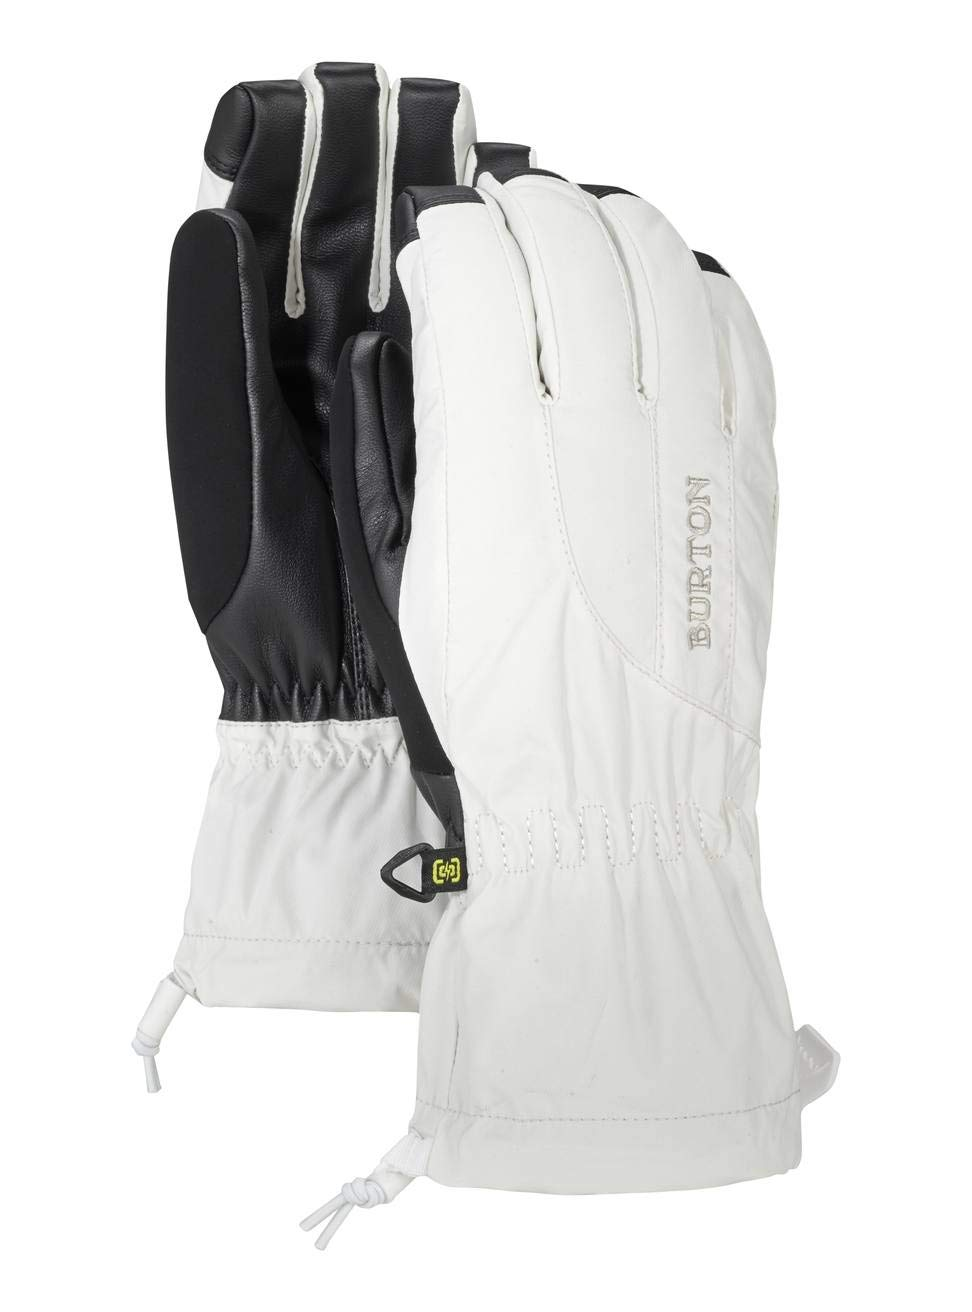 Guantes de esqu/í para Mujer Burton Handschuhe WB Profile Gloves